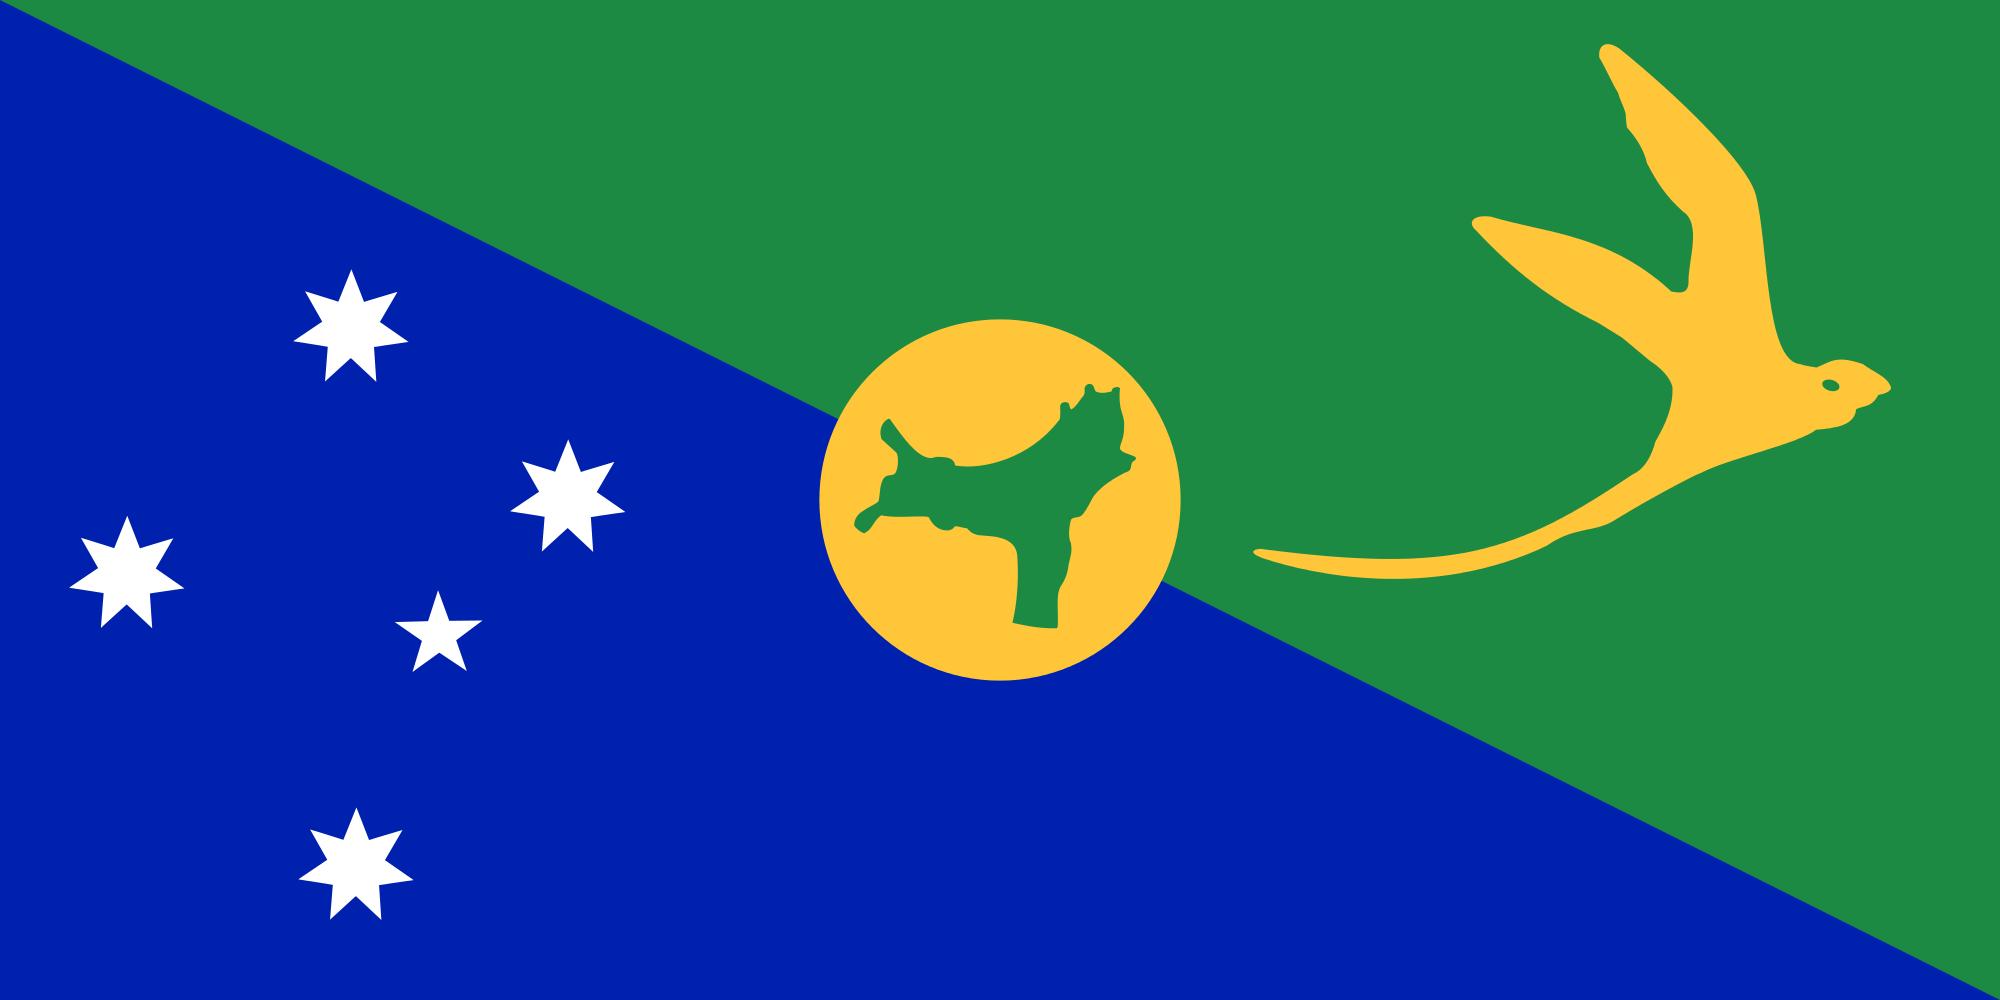 Isola di Natale, paese, emblema, logo, simbolo - Sfondi HD - Professor-falken.com